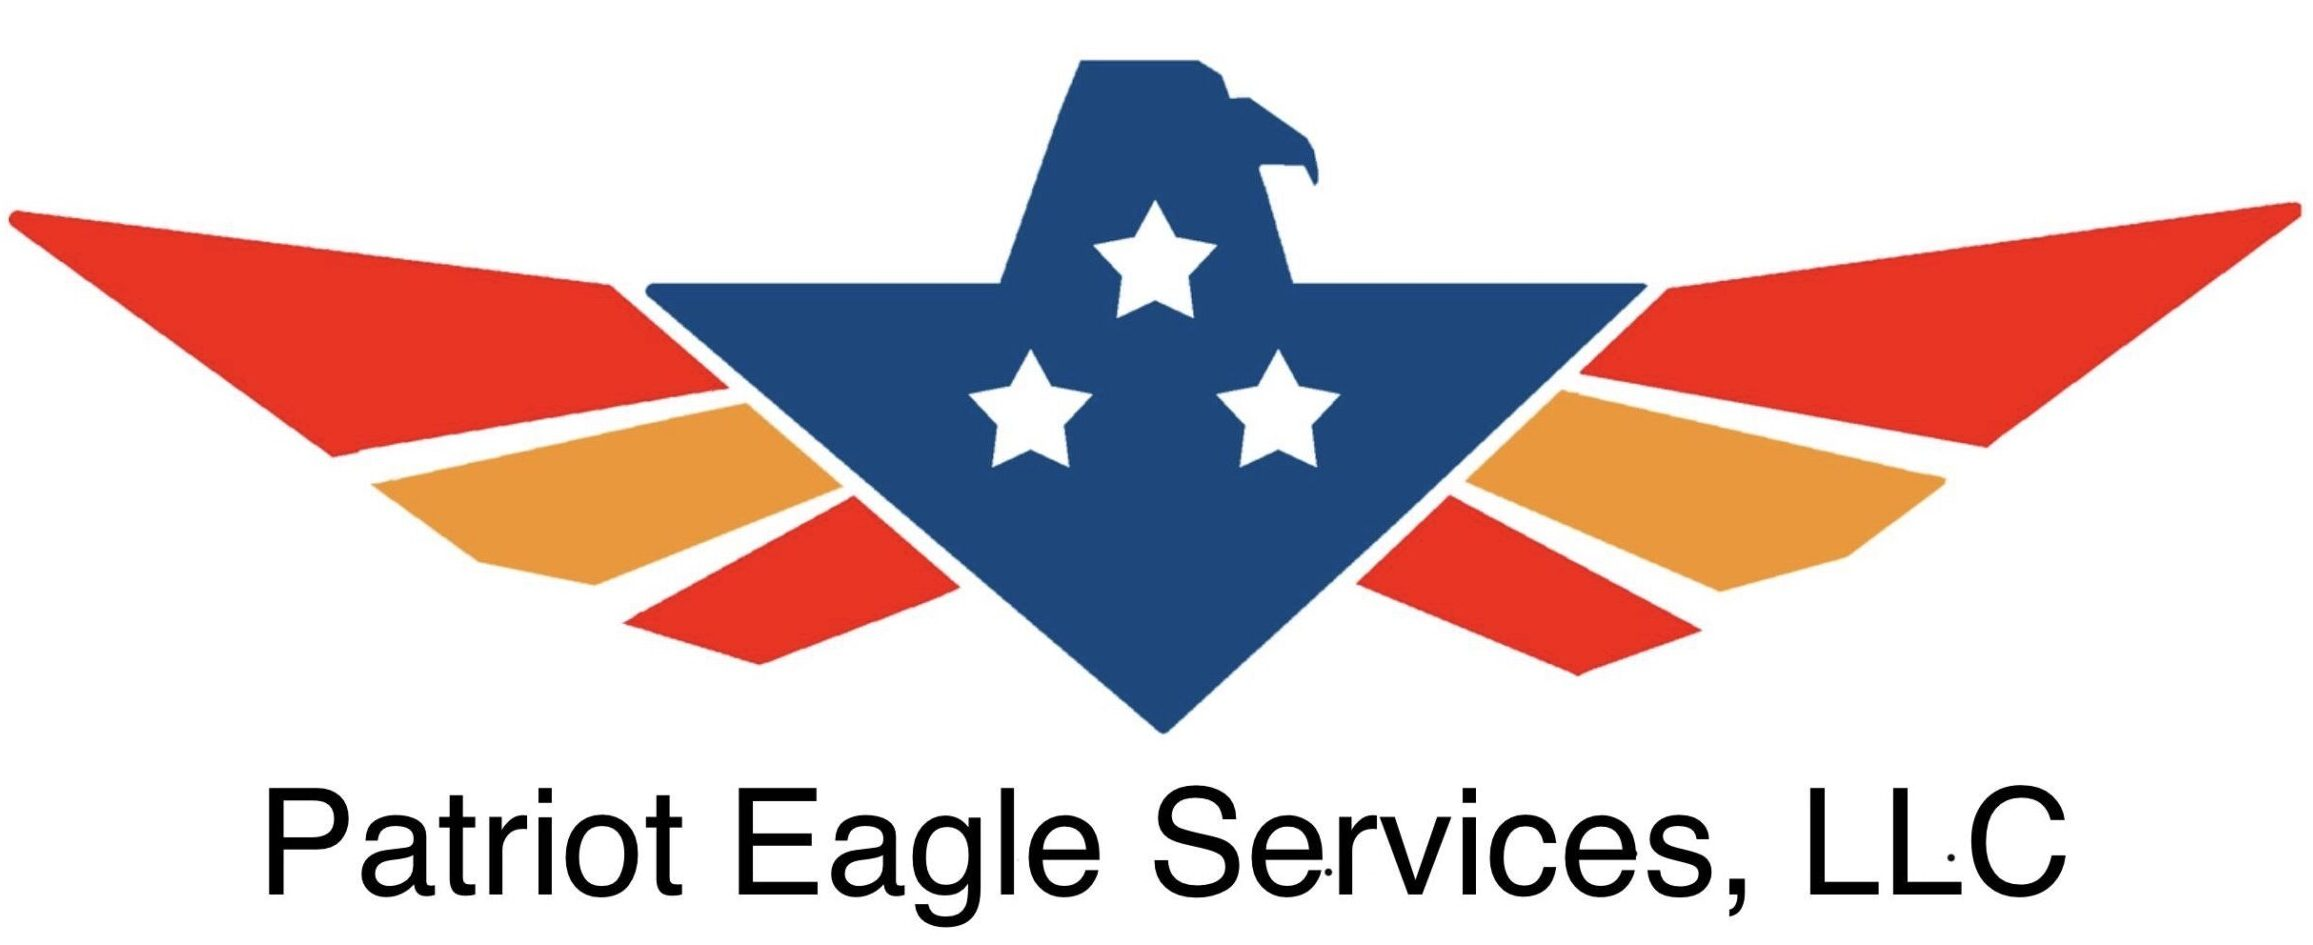 Patriot Eagle Services, LLC